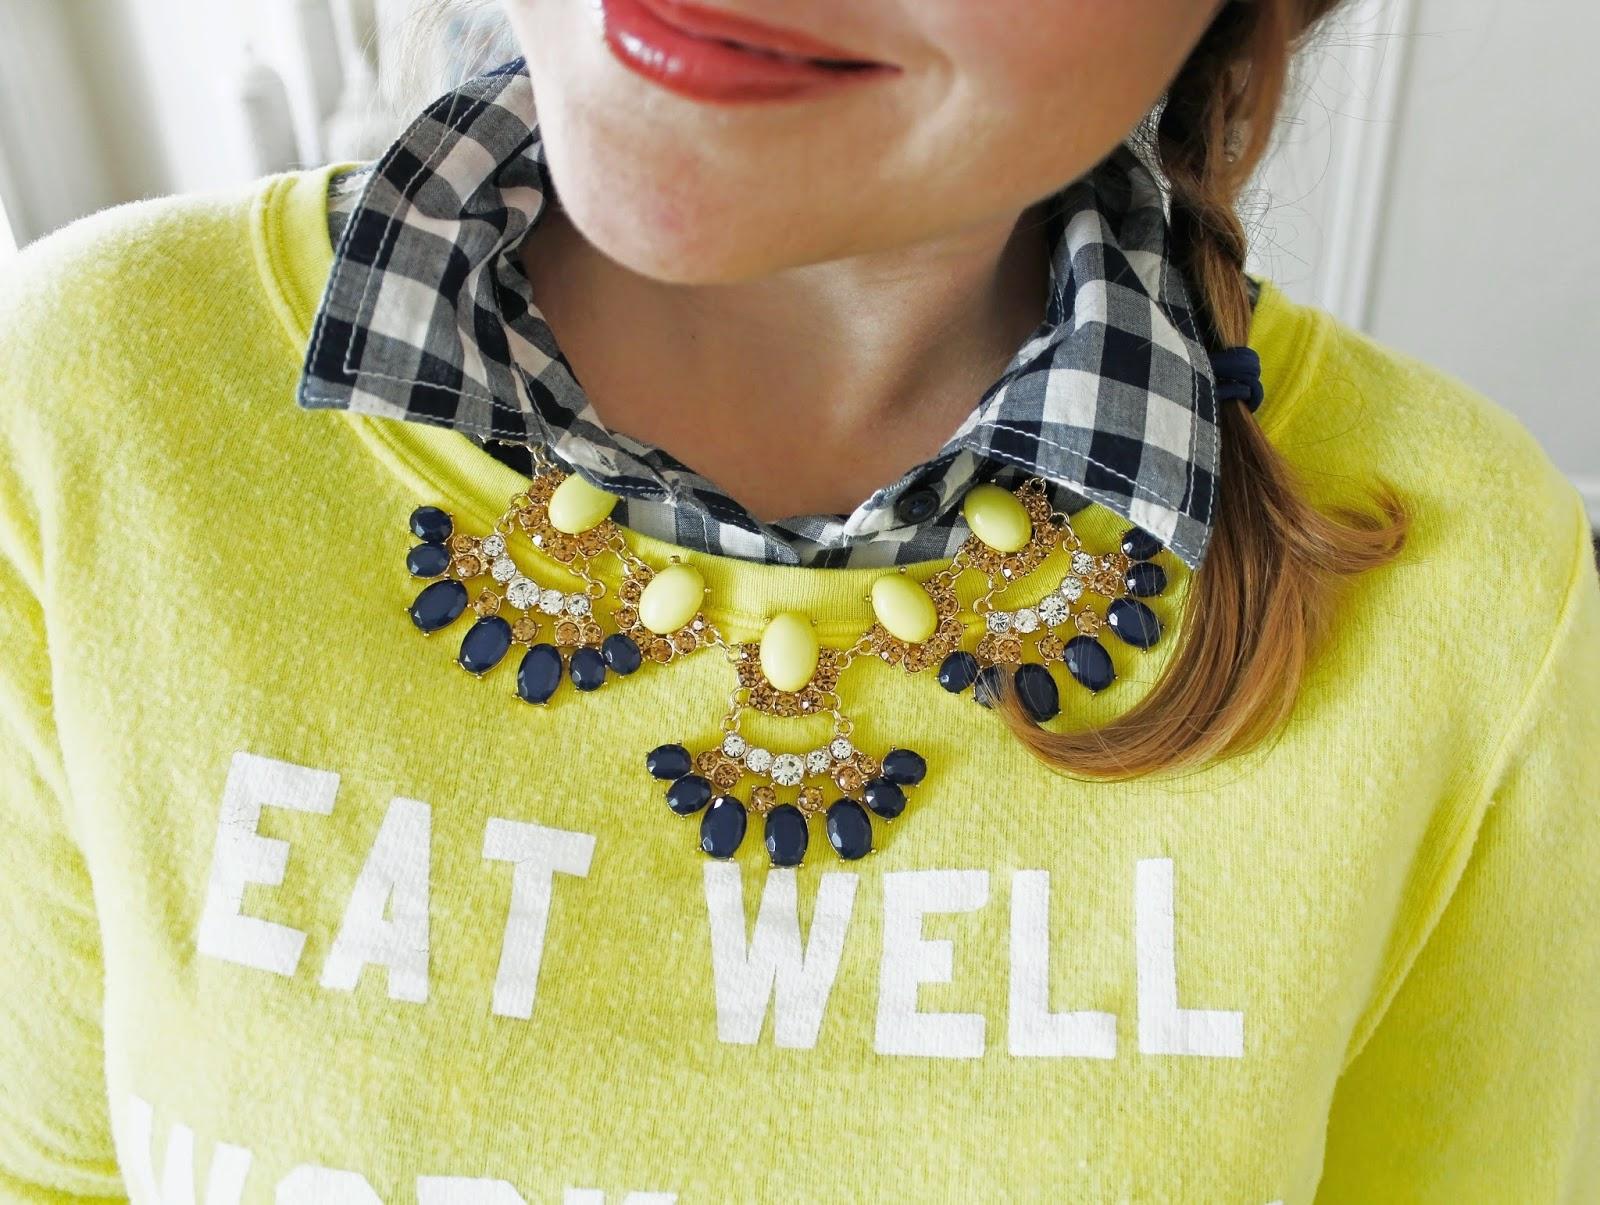 Wildfox Yellow Mantra Sweatshirt, Target Statement Necklace, Gingham Navy Gap Shirt, Wildfox yellow mantra sweatshirt